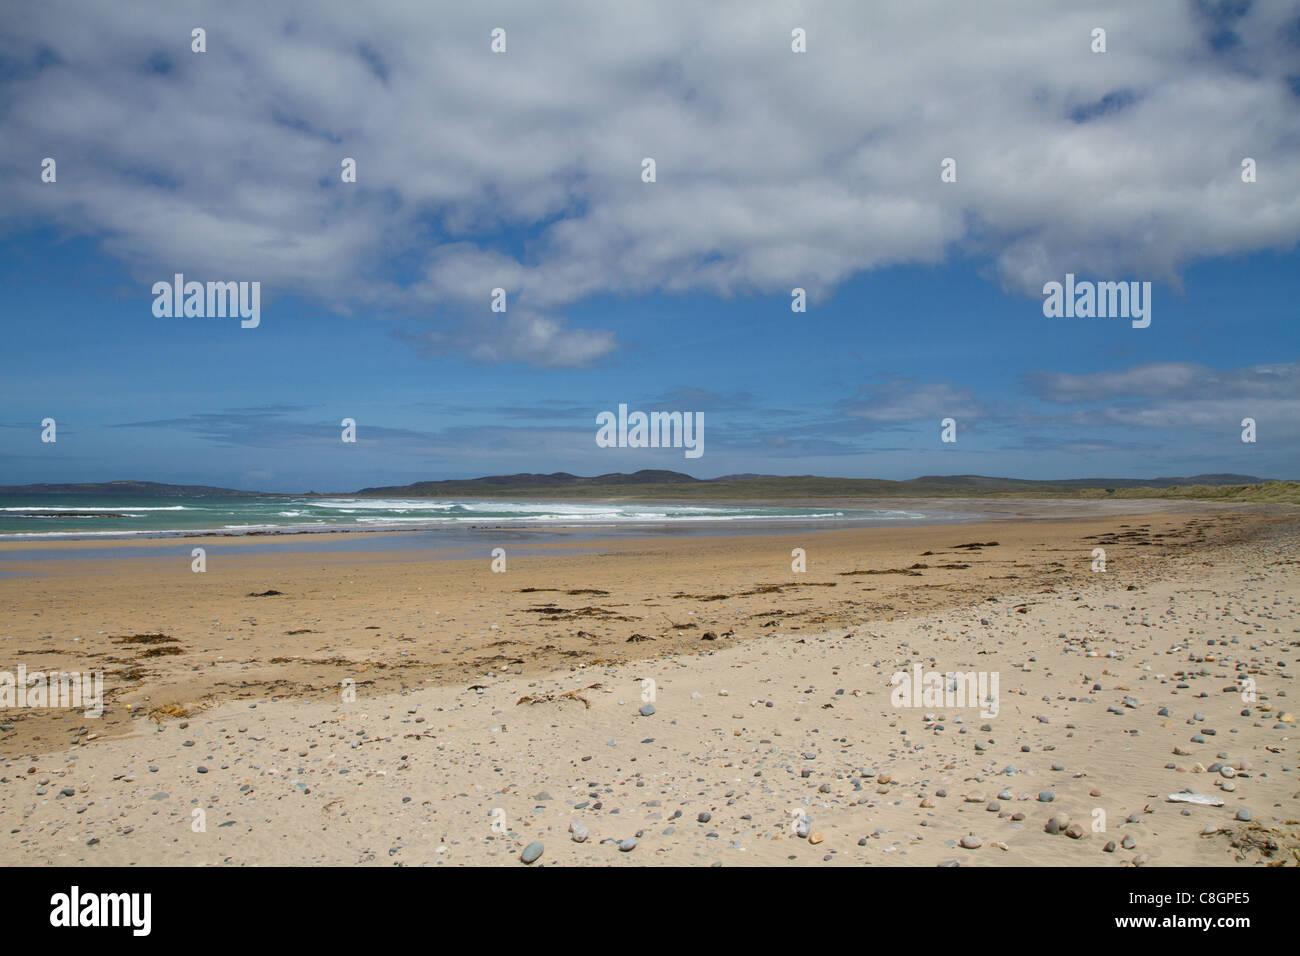 Pollan Beach, Ballyliffin, Co. Donegal - Stock Image